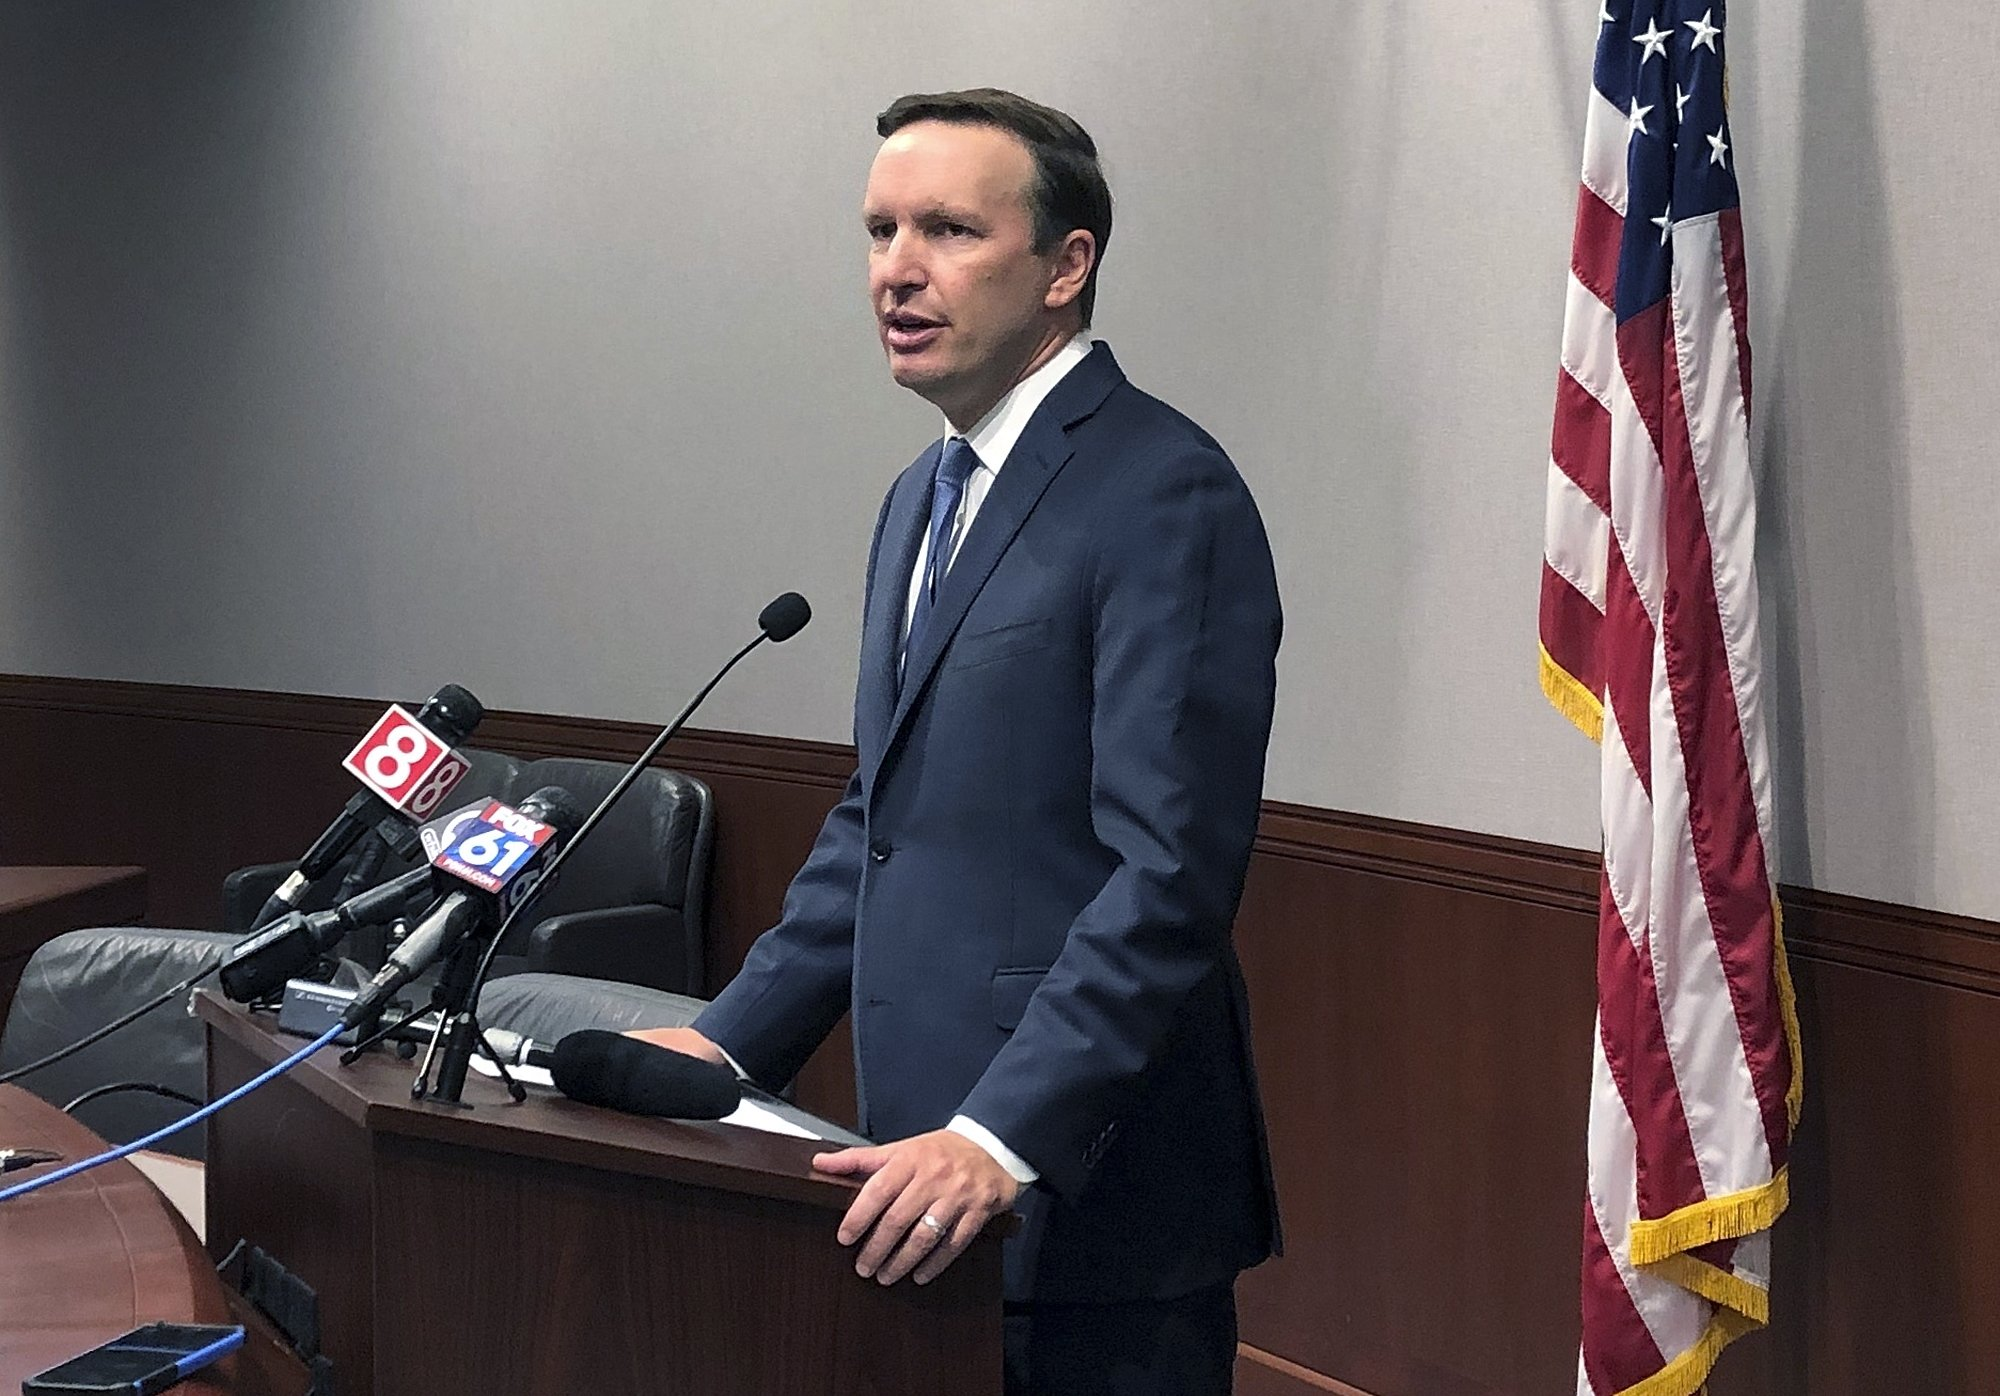 Murphy says White House still open to background checks bill